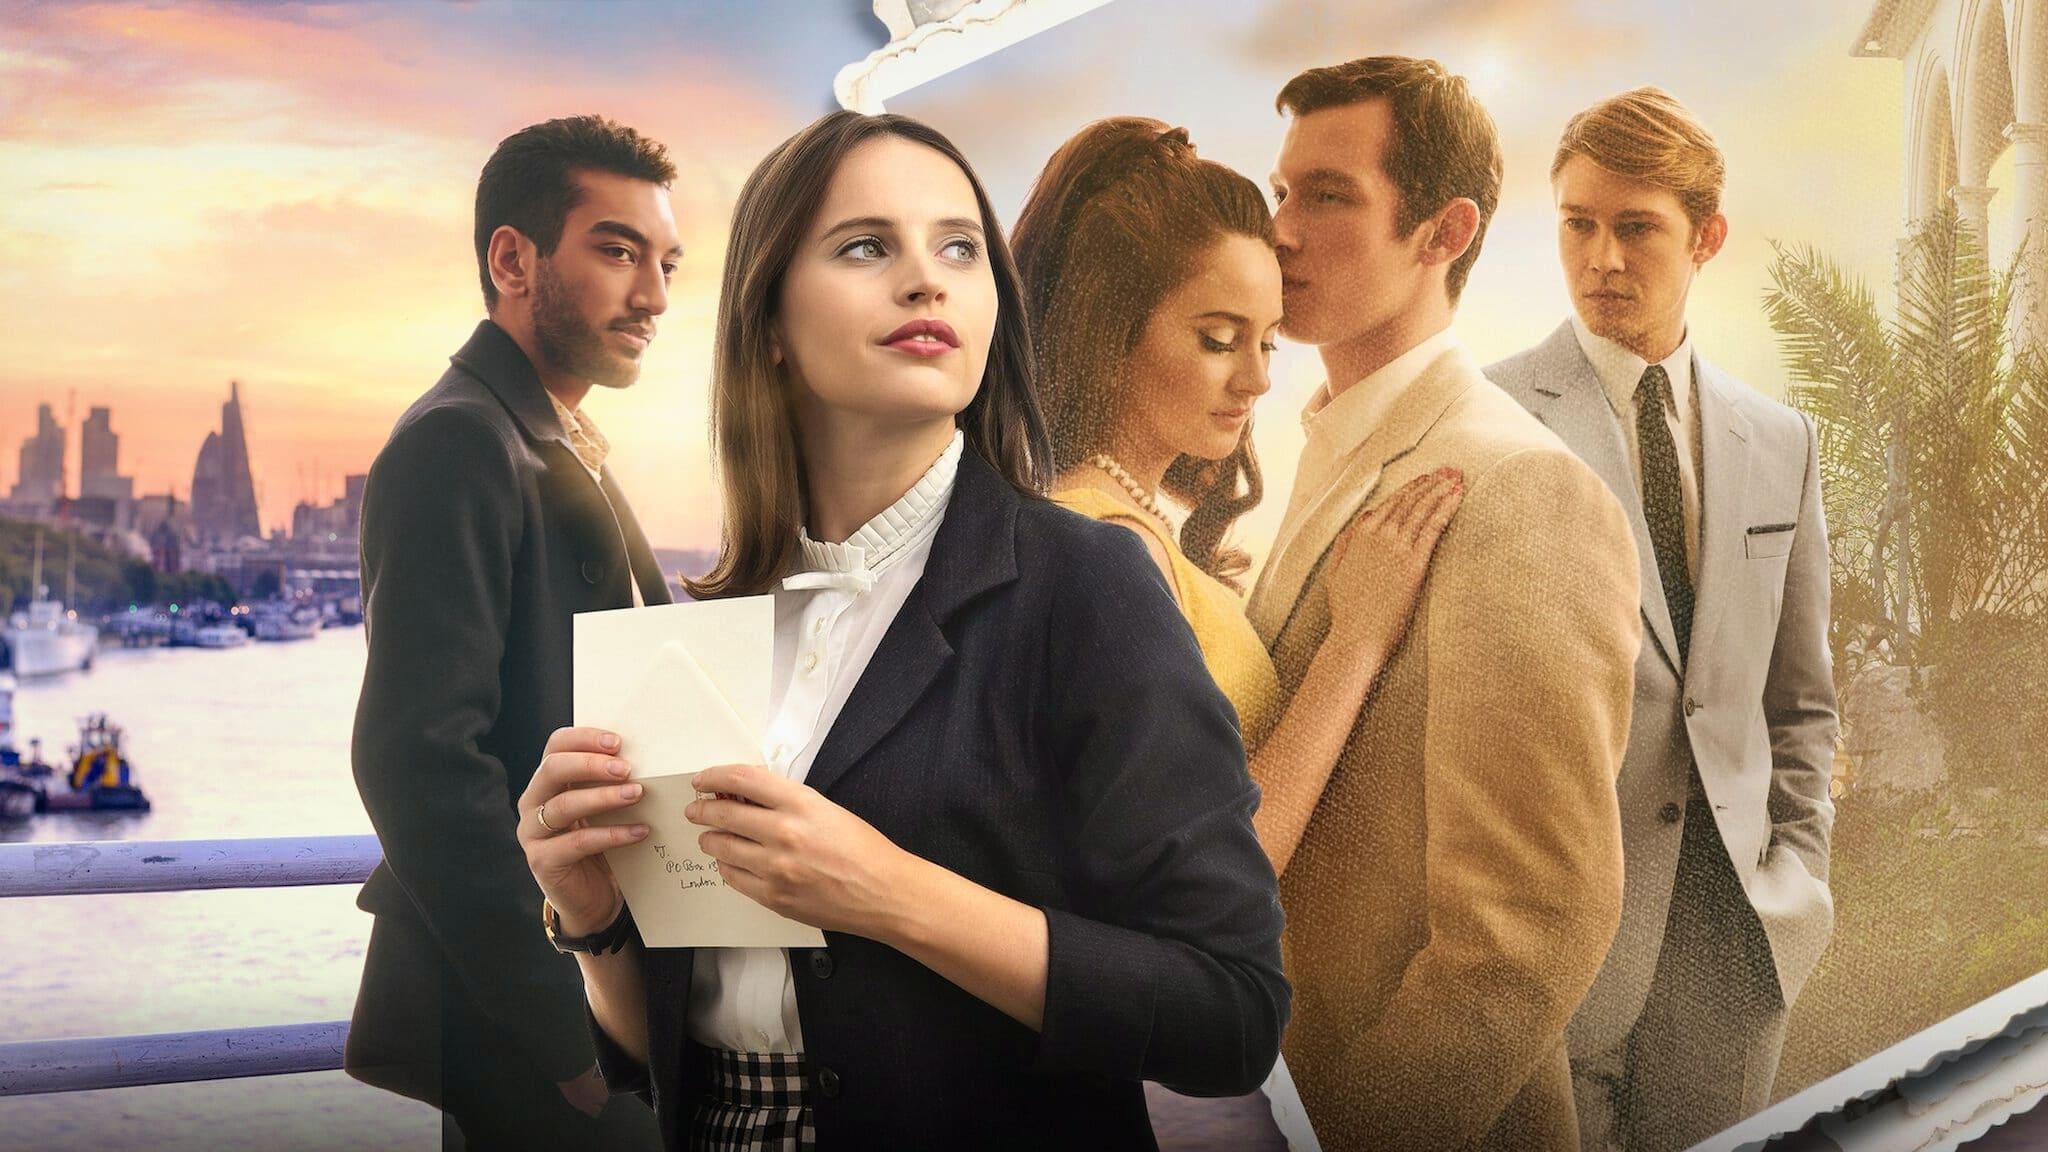 best romantic movies 2021 so far